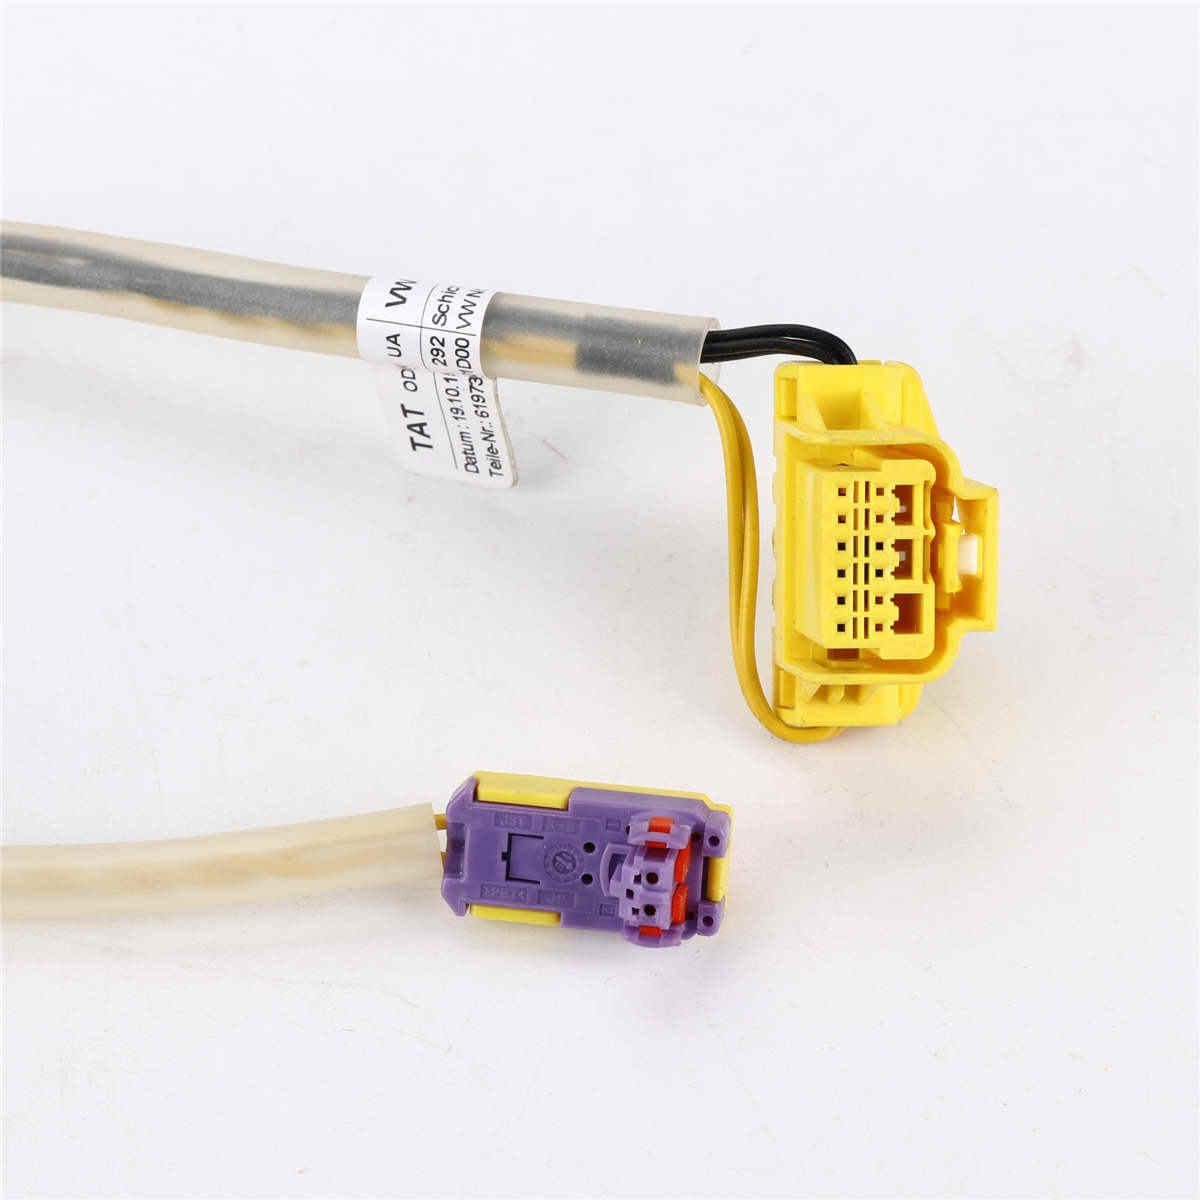 medium resolution of  1set steering wheel wire cable for vw golf mk6 passat b6 tiguan 5k0 971 584 c